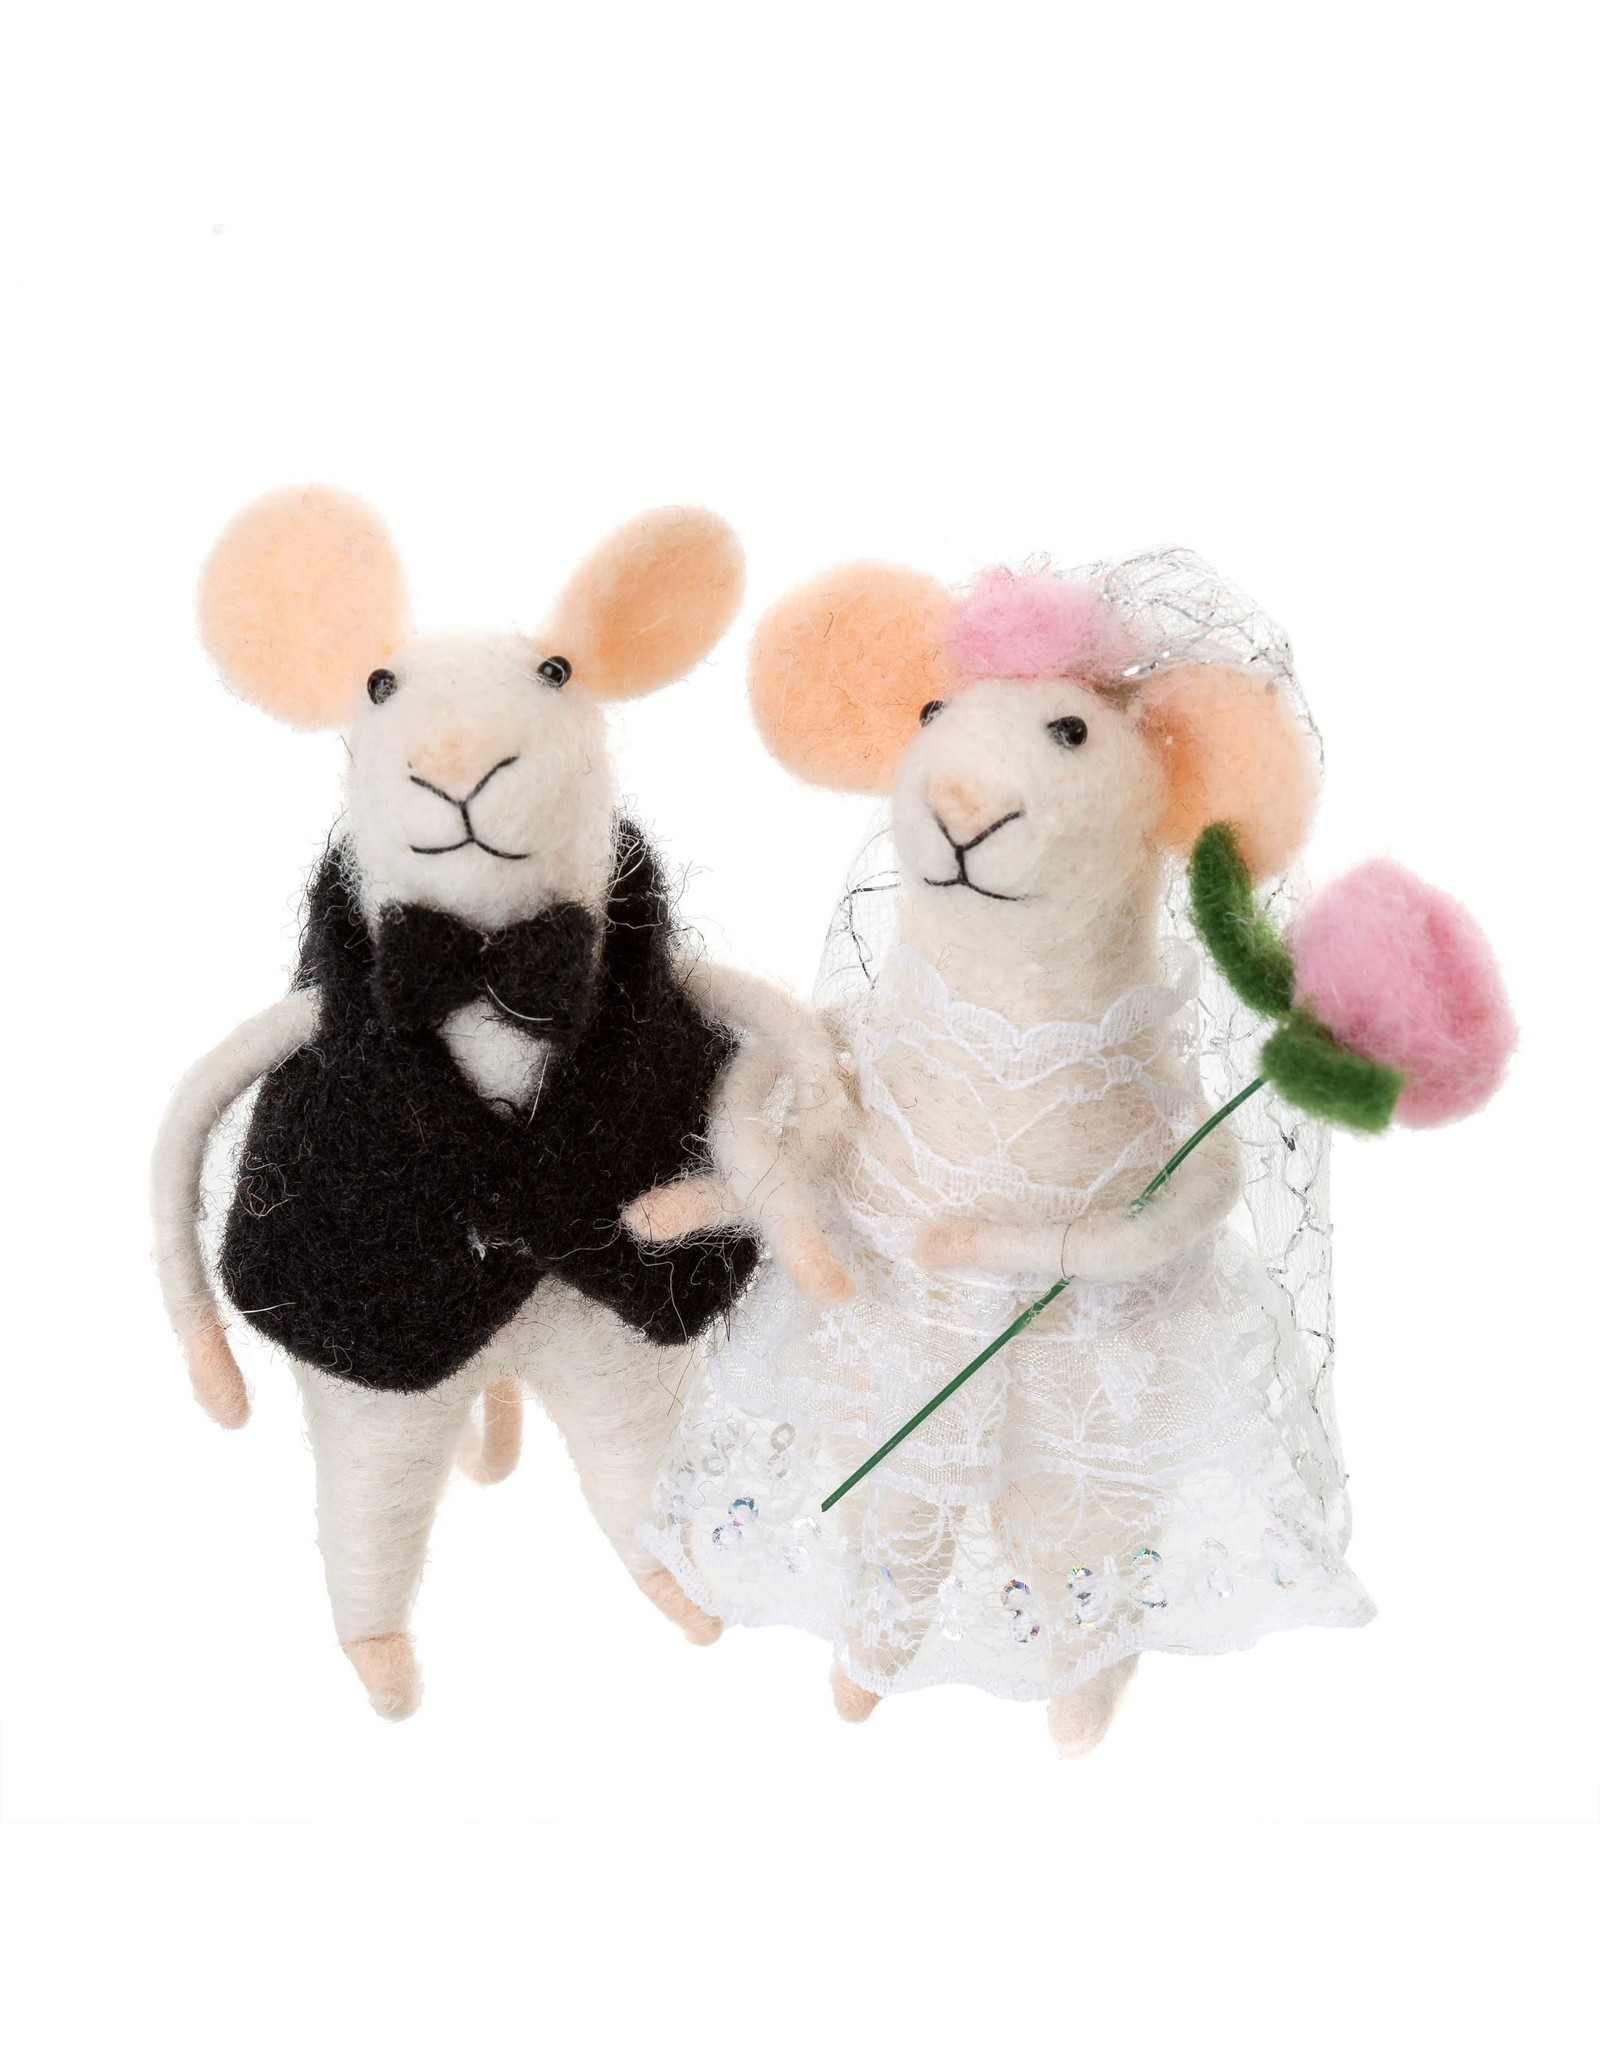 Newlywed Mice Ornament S/2